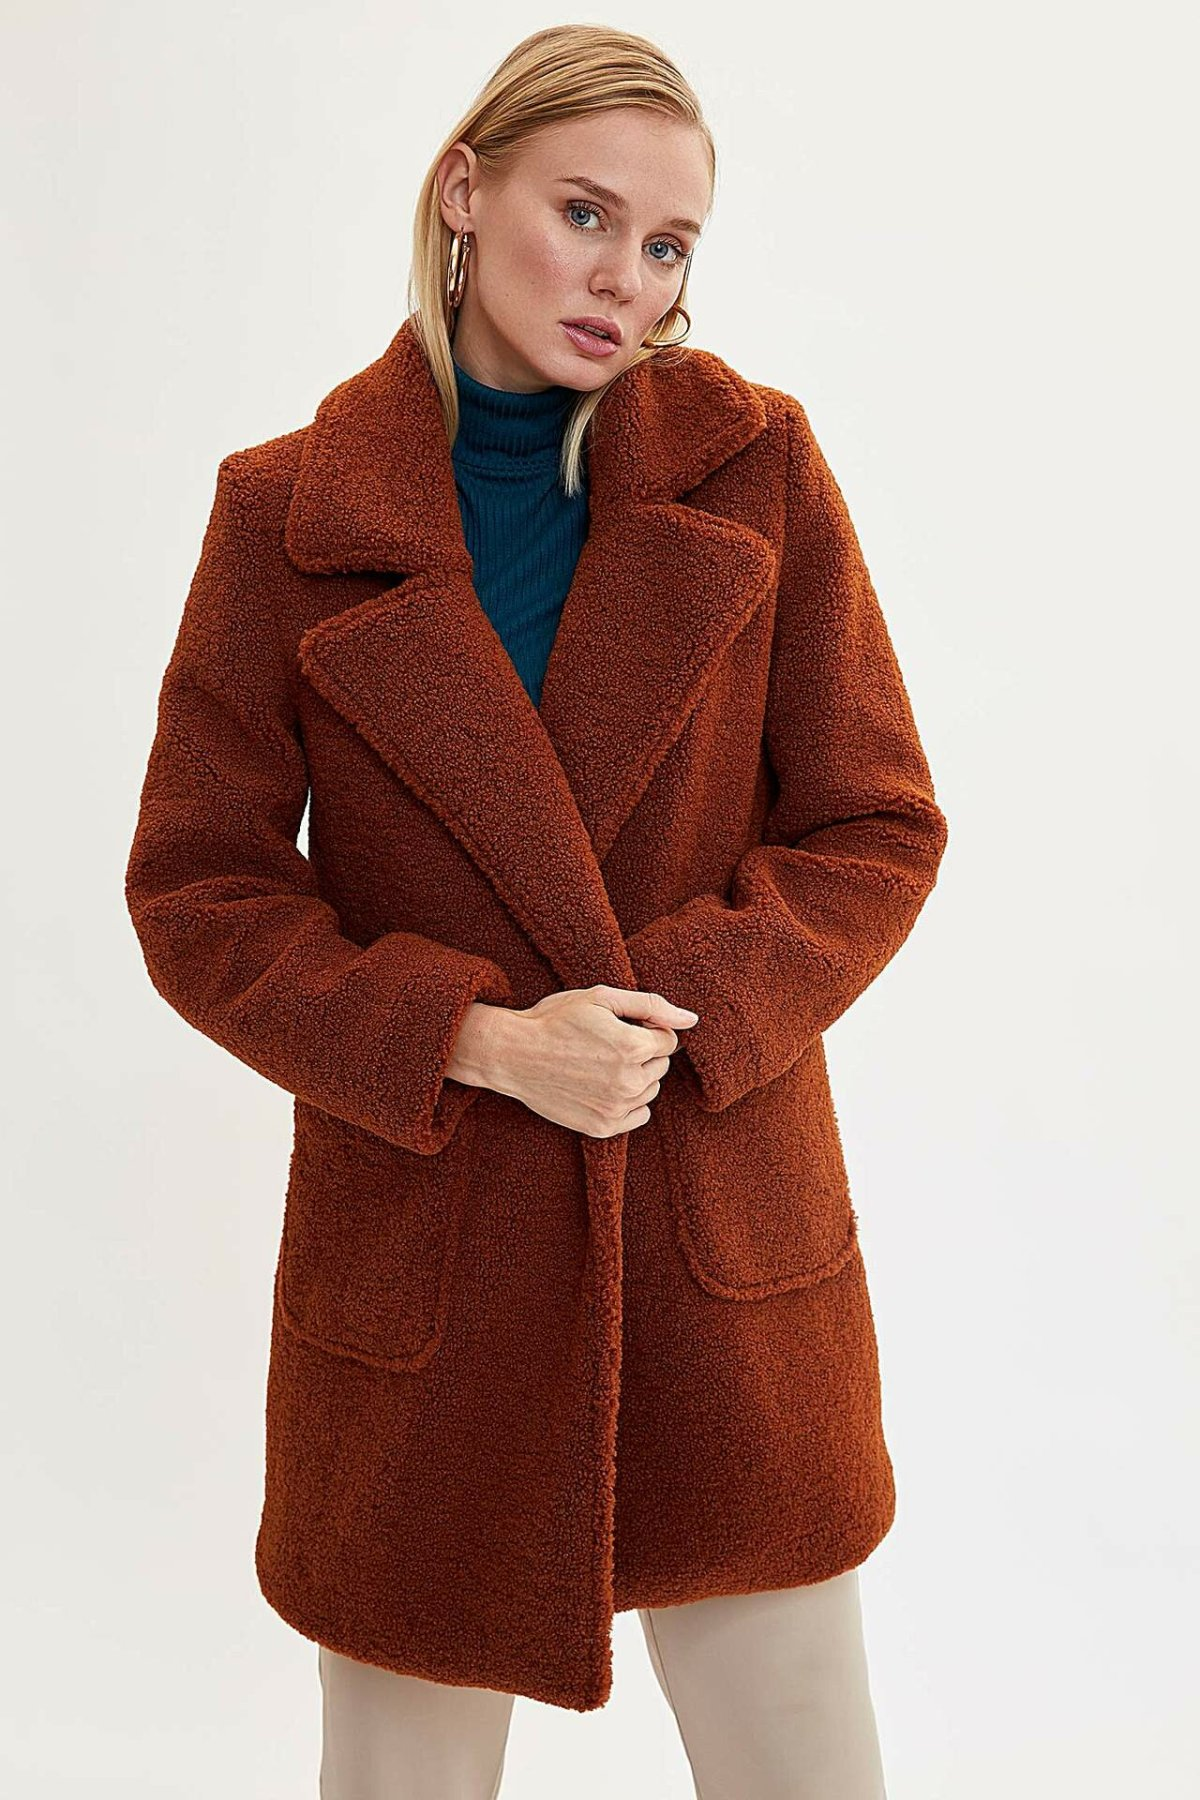 DeFacto Lady Fashion Lapel Collar Thicken Jacket Women Solid Elegant Warm Long Coat Winter New - L9617AZ19WN